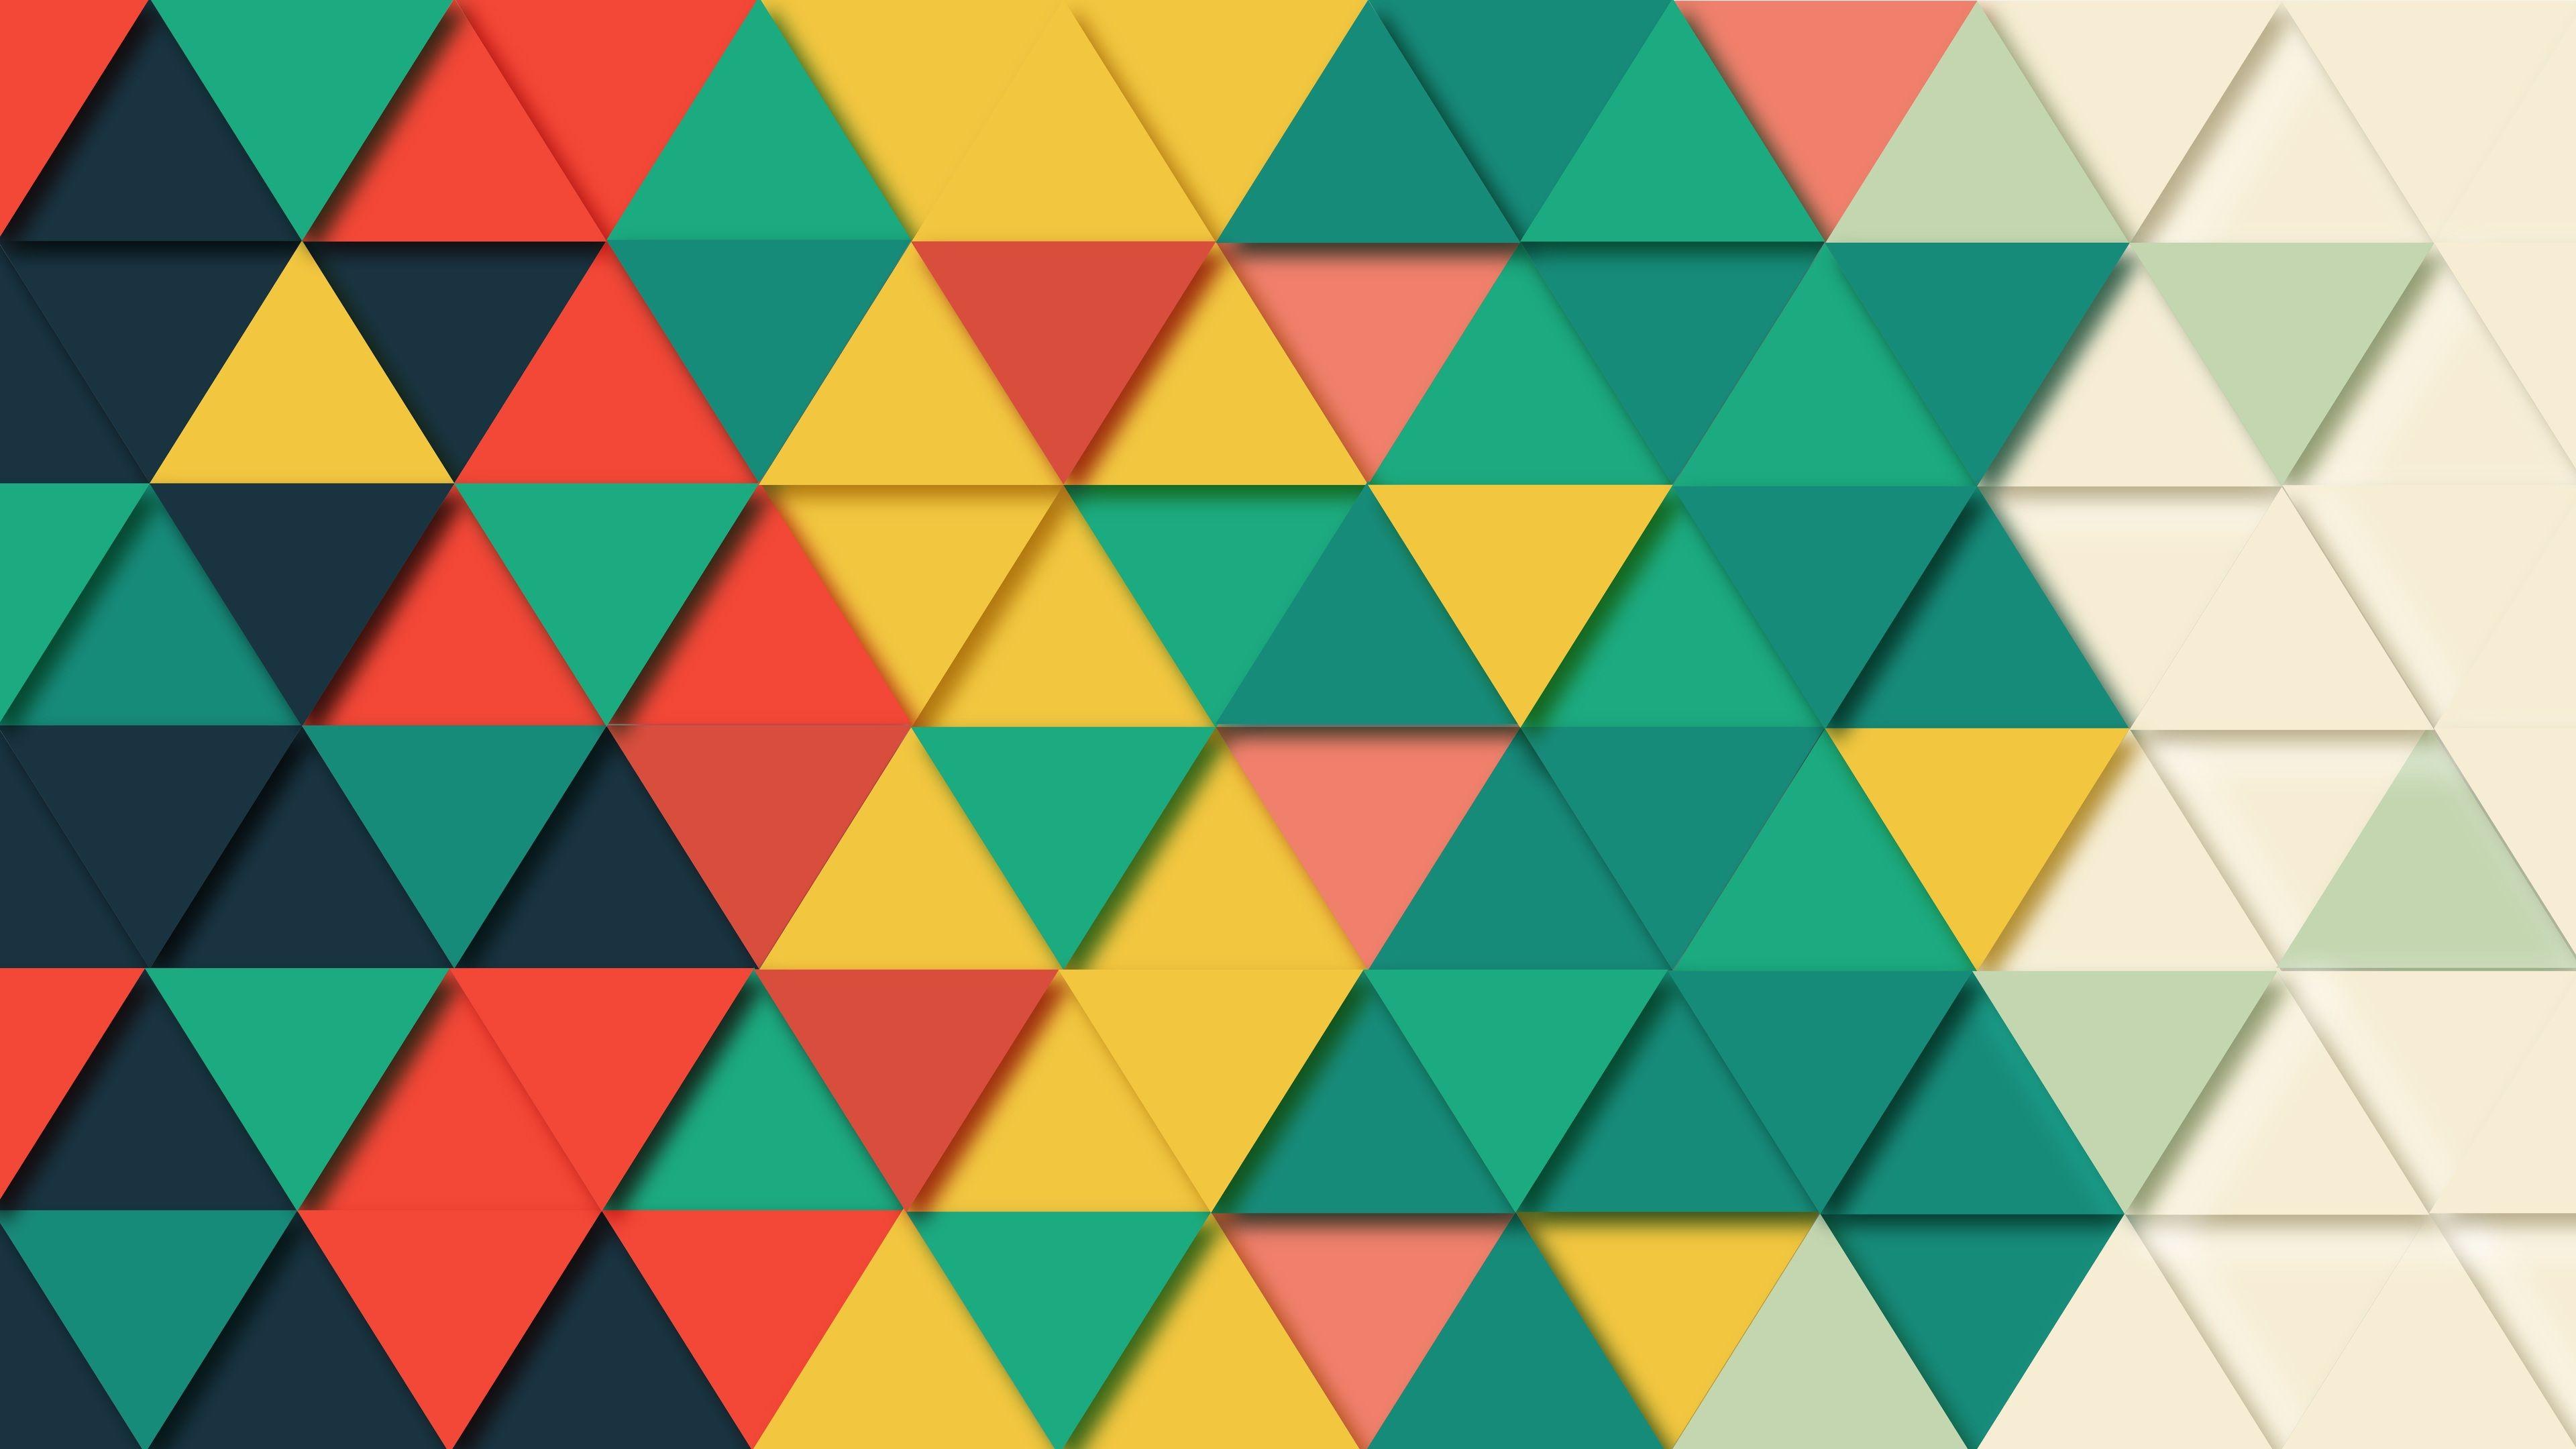 Background Geometric Triangle Pattern 4k Triangle Wallpapers Pattern Wallpapers Hd Wallpapers Digital Art Wallpaper Palitra Oboev Abstraktnoe Oboi Iskusstvo